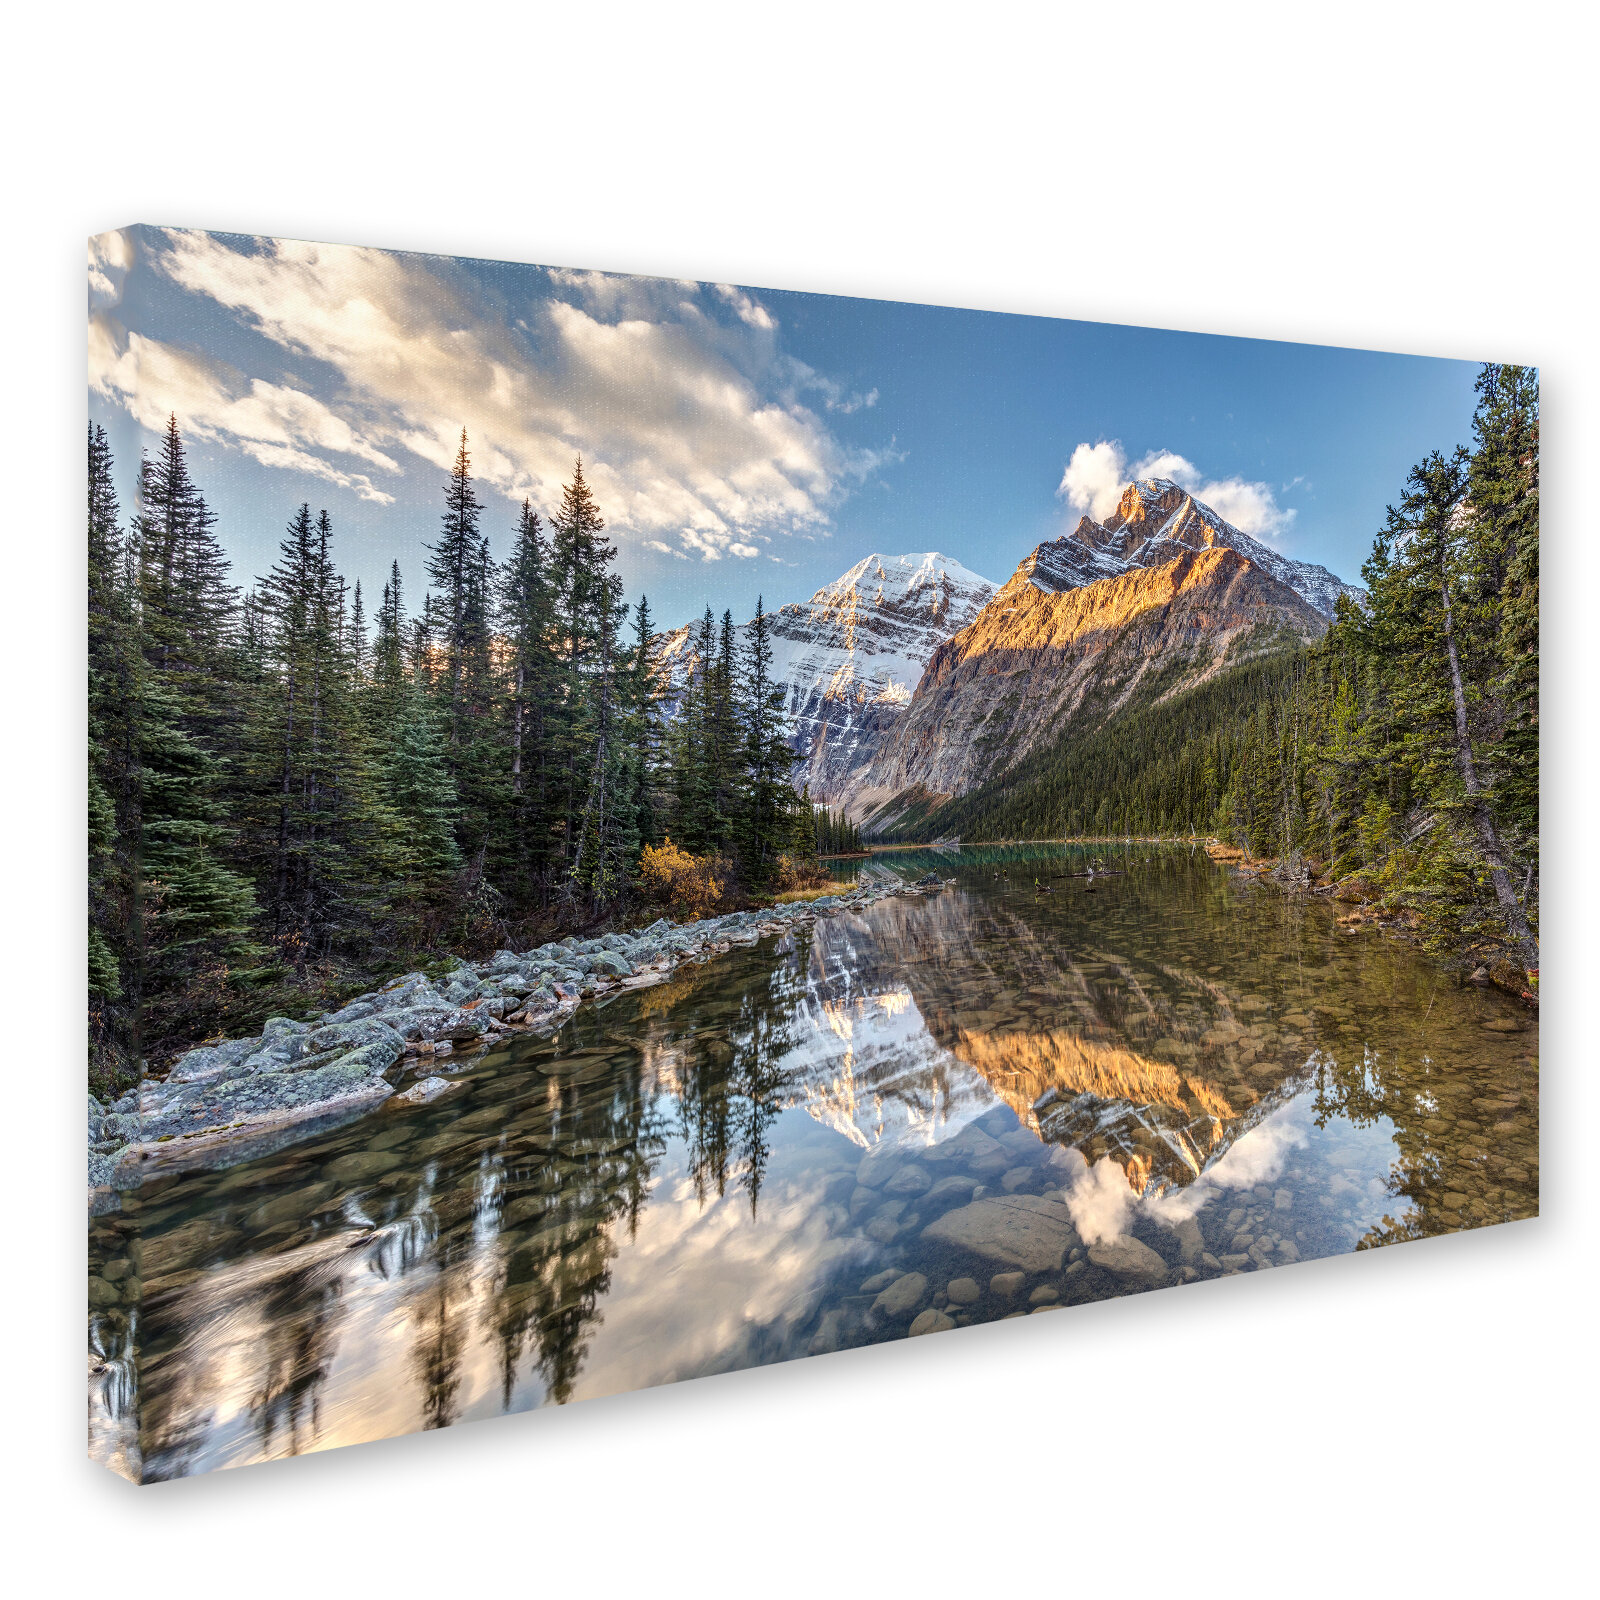 Trademark Art Jasper National Park By Pierre Leclerc Photographic Print On Wrapped Canvas Wayfair